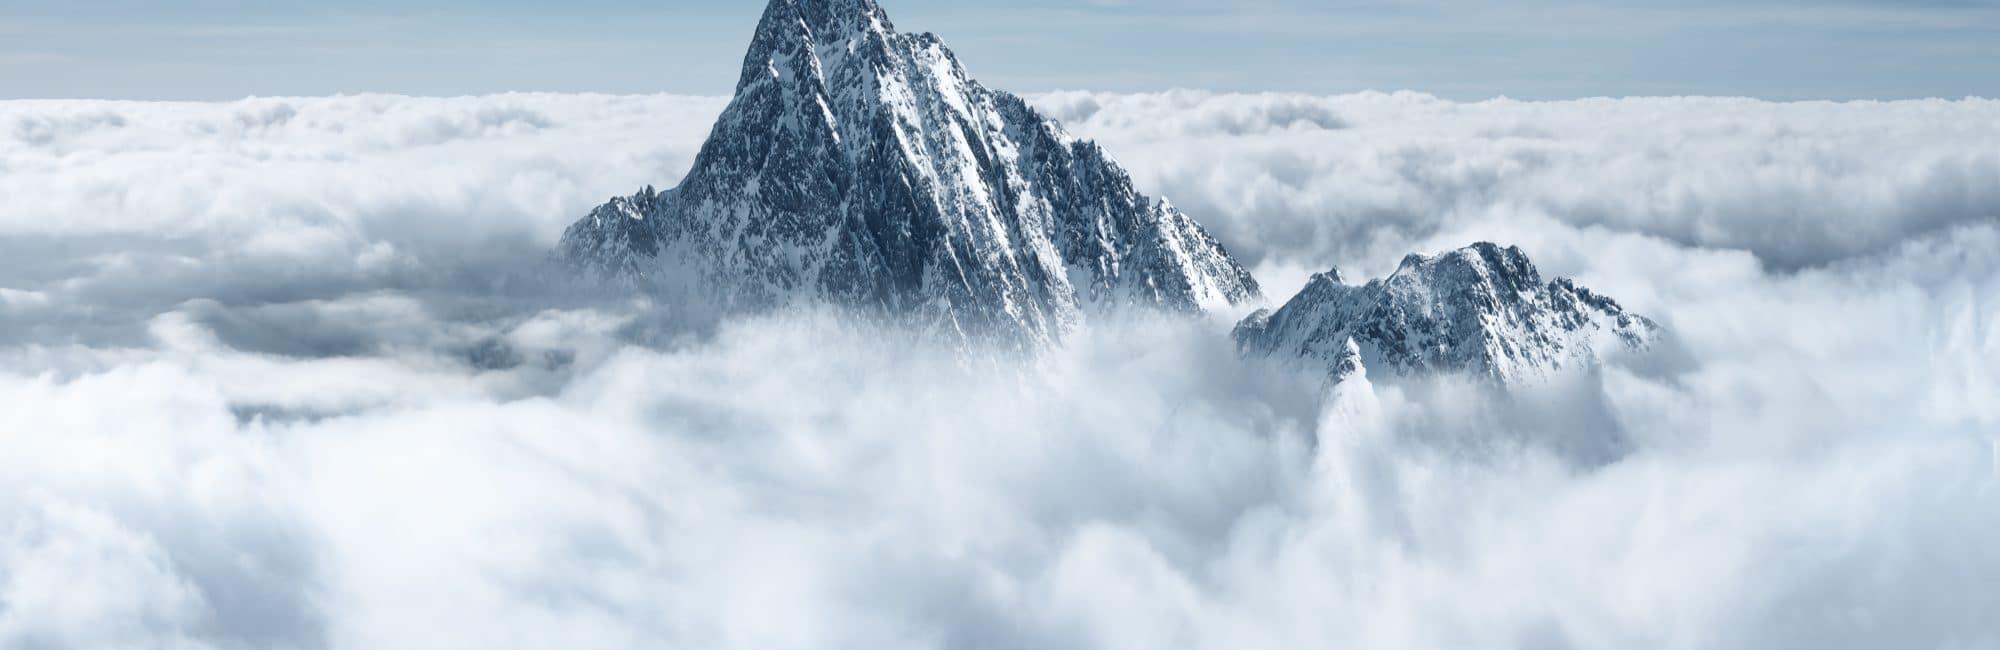 Haut sommet de montagne